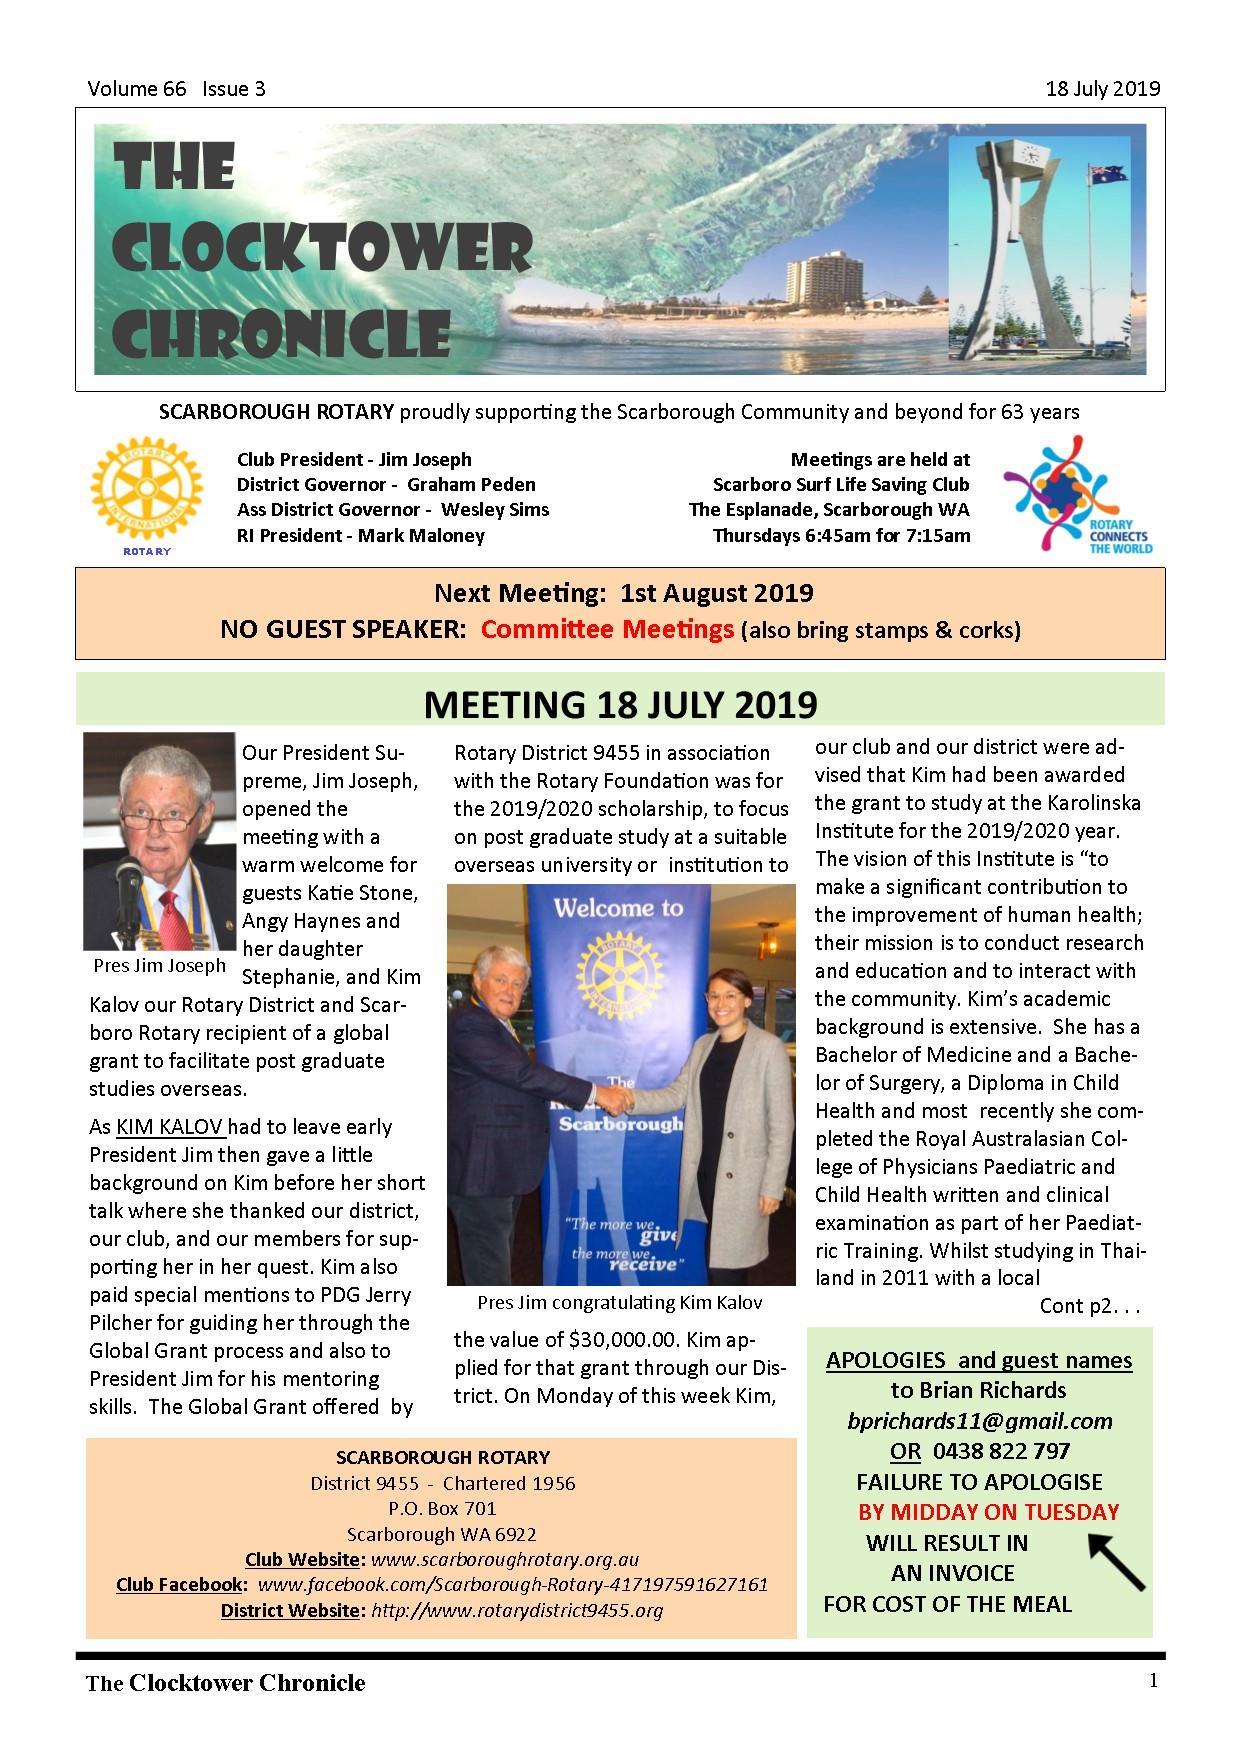 The Clocktower Chronicle Vol 66 Issue 3 (Jul 18, 2019)